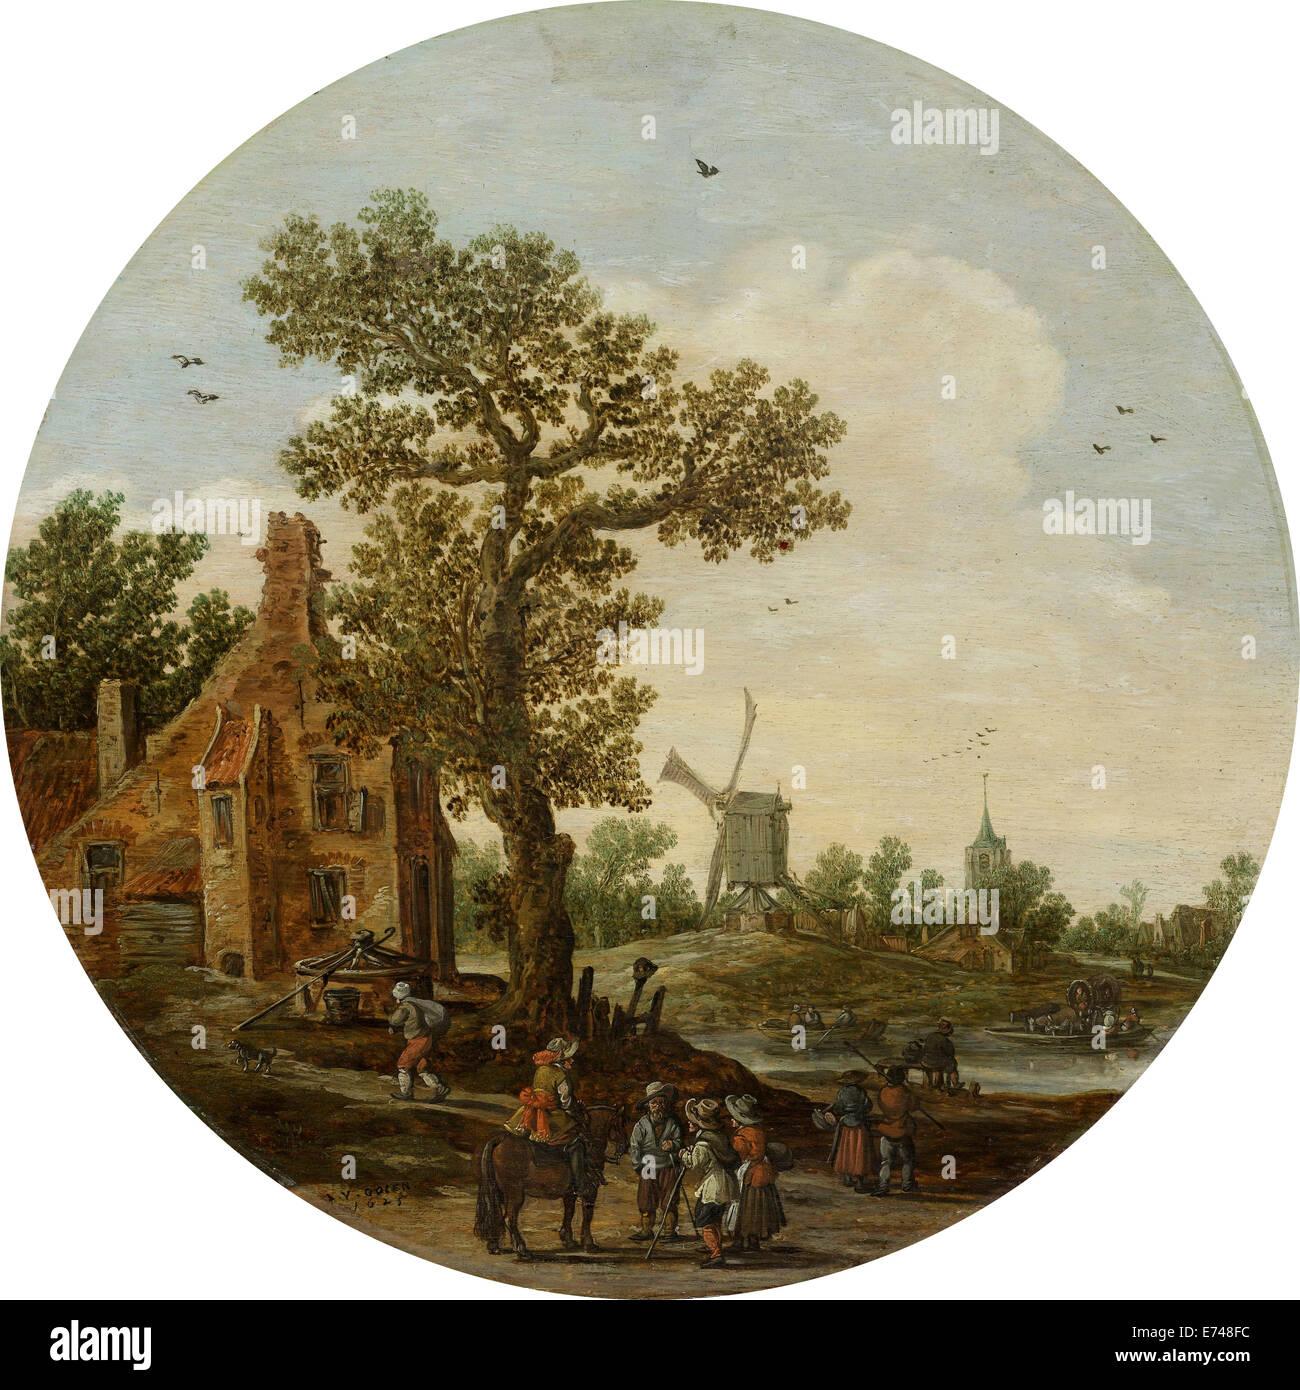 Summer - by Jan van Goyen, 1625 - Stock Image